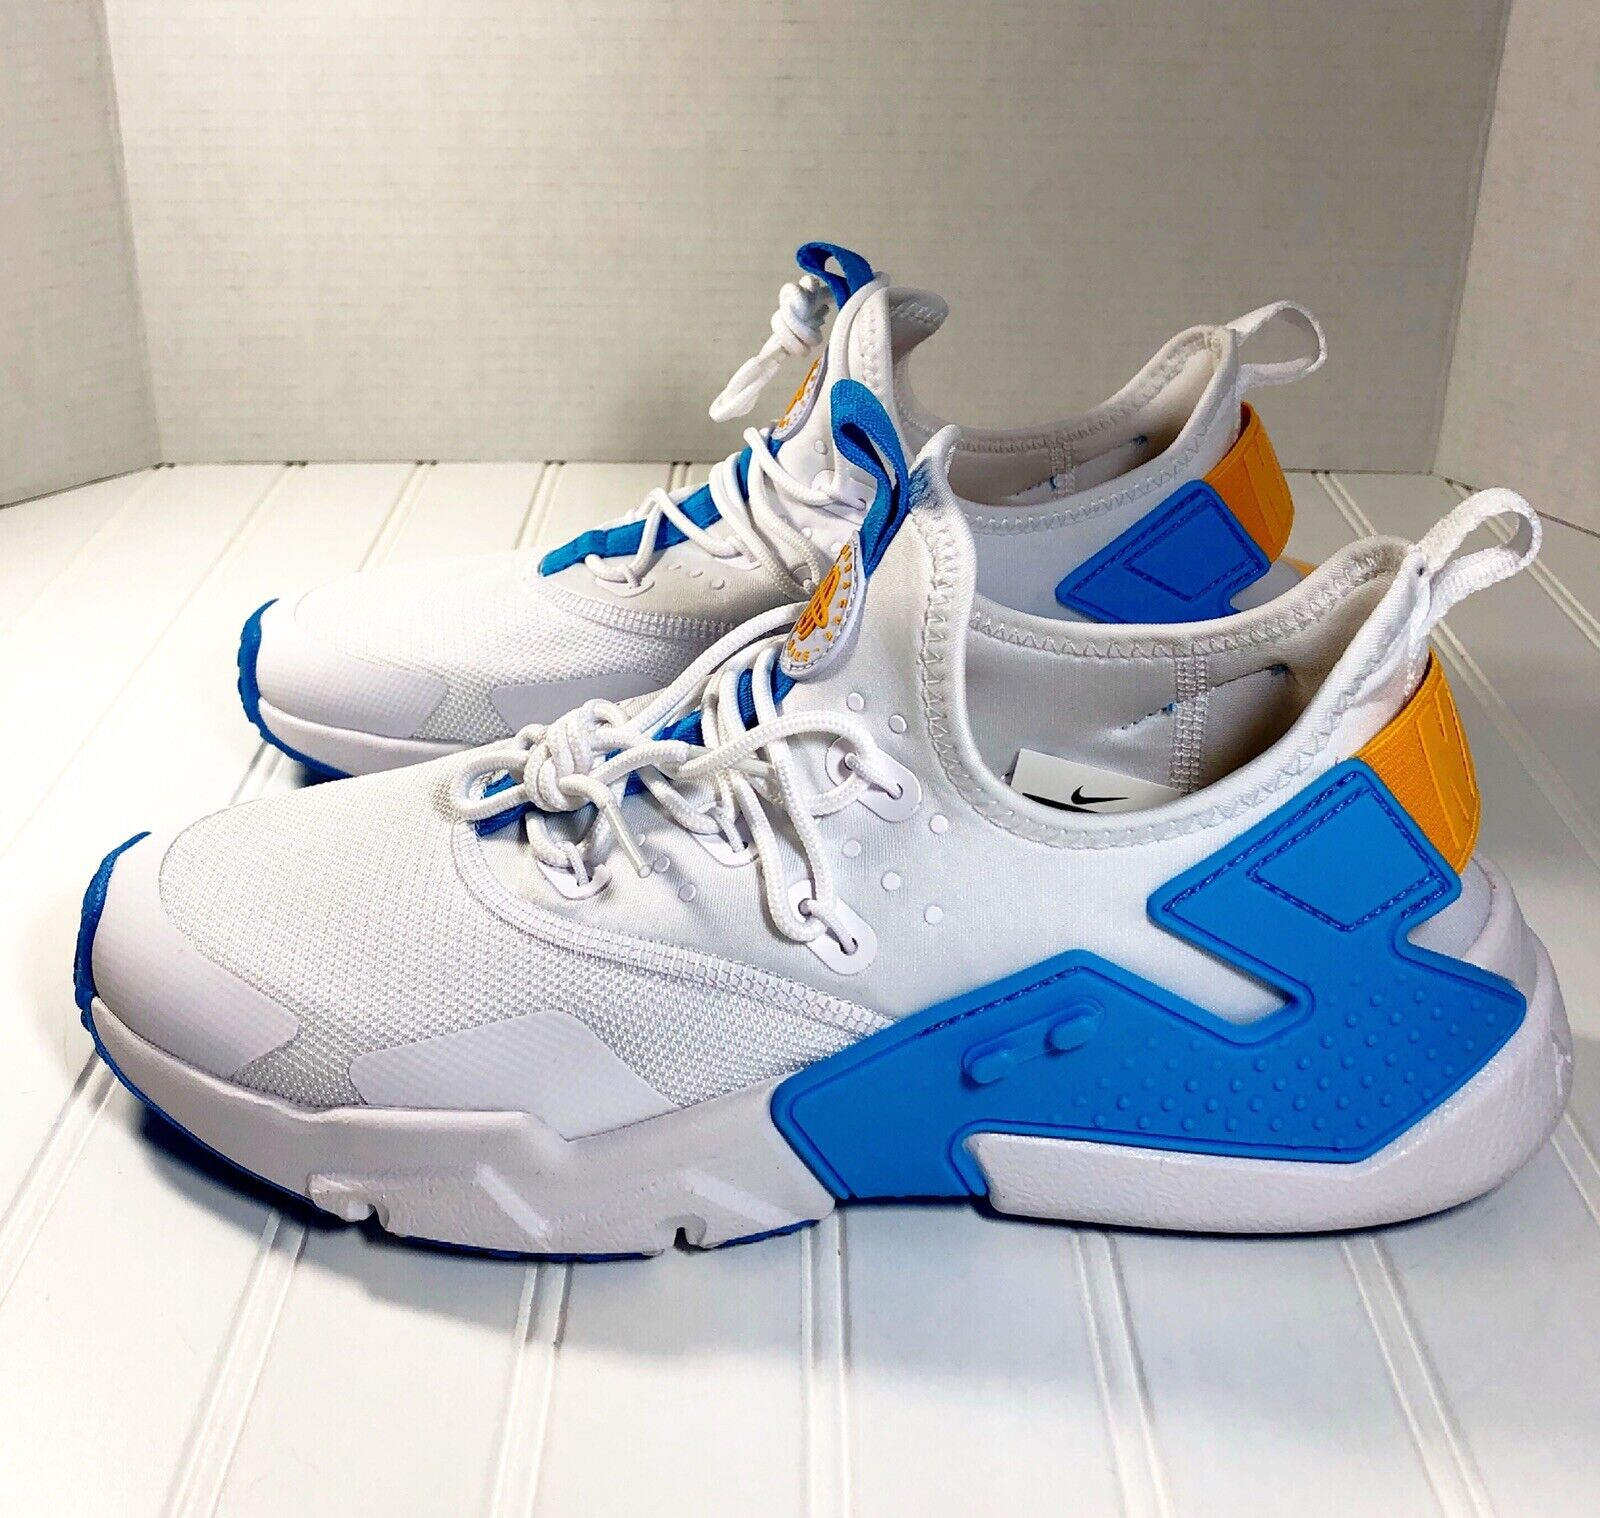 Nike Air Huarache Drift Mens AH7334-101 White Equator bluee gold shoes Size 9 New